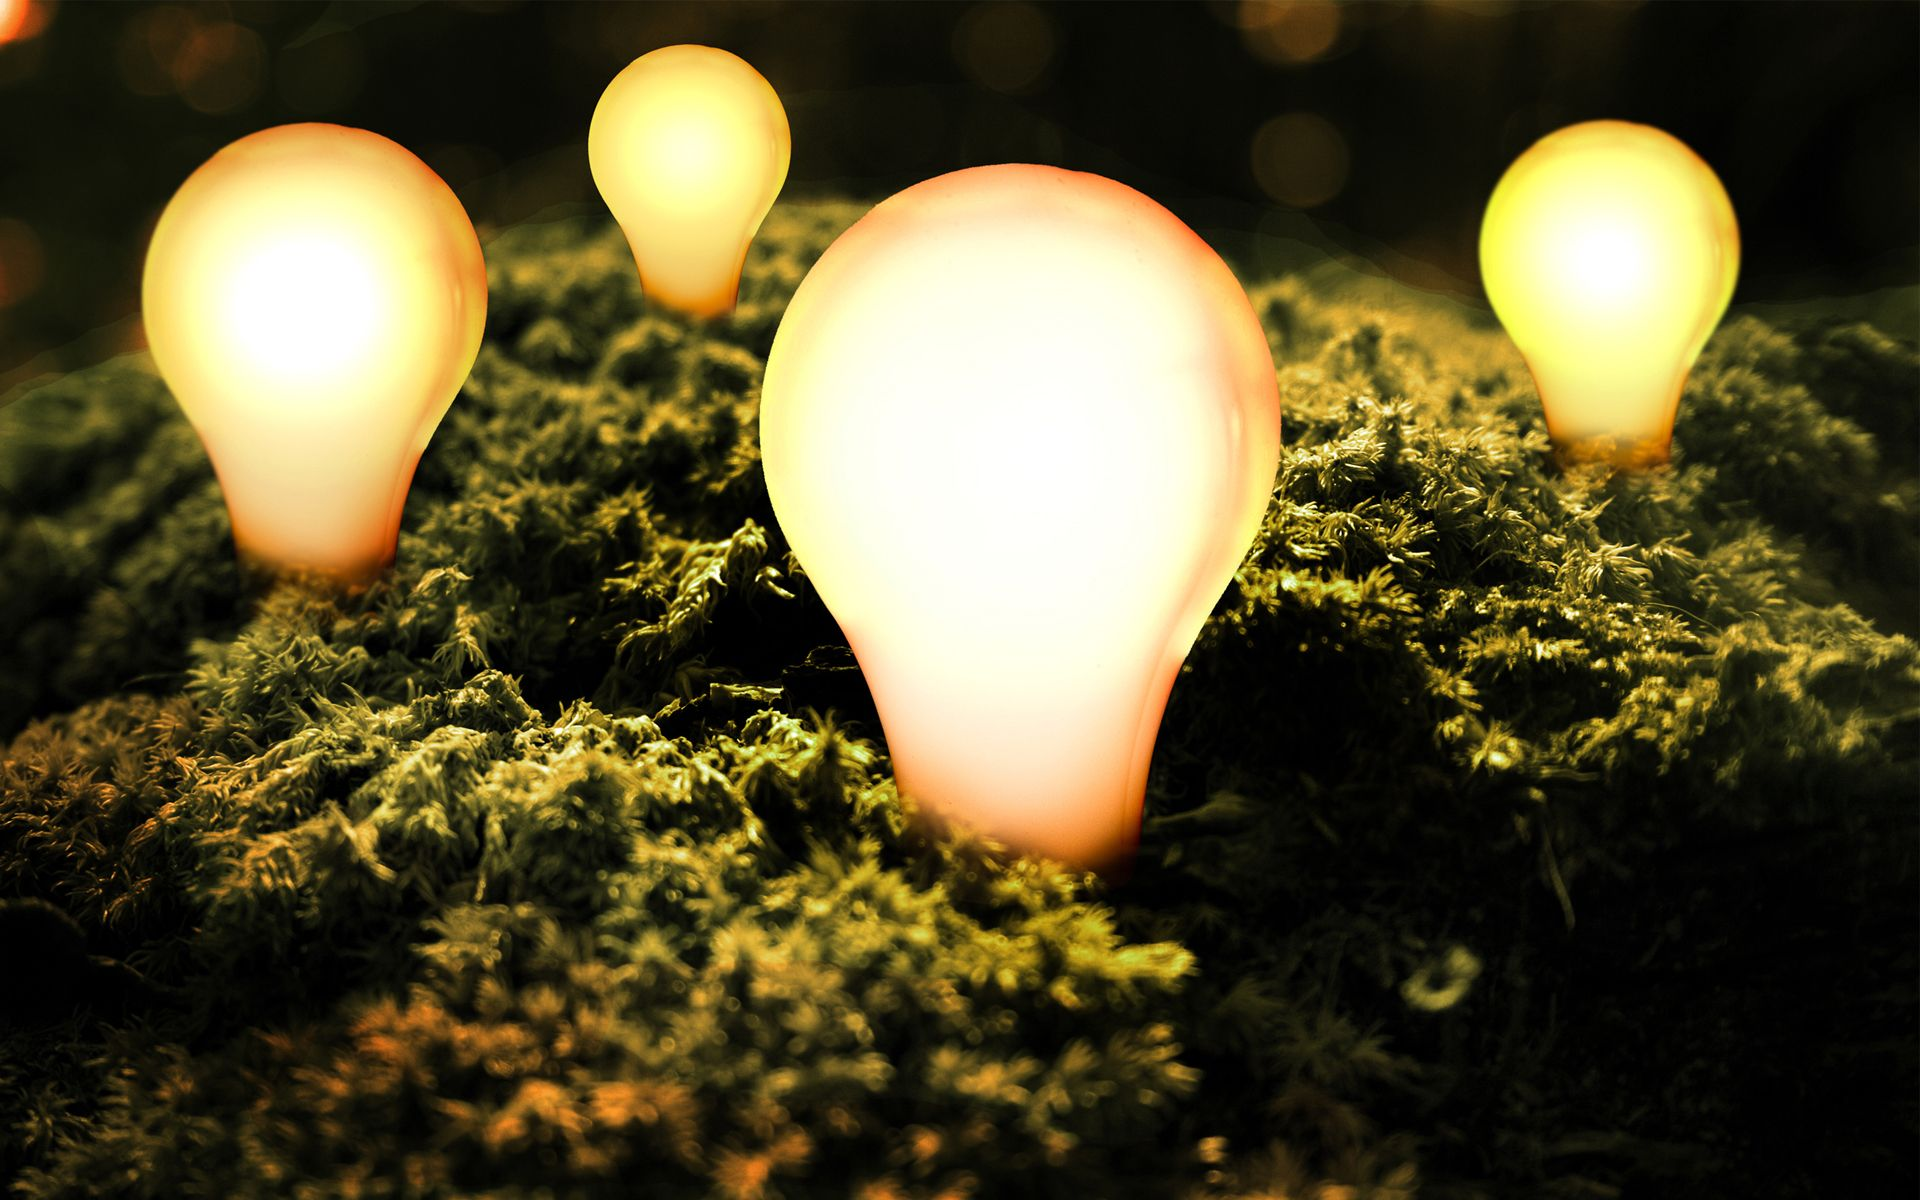 Sfondi hd energia pulita sfondi hd gratis for Photo hd gratuite